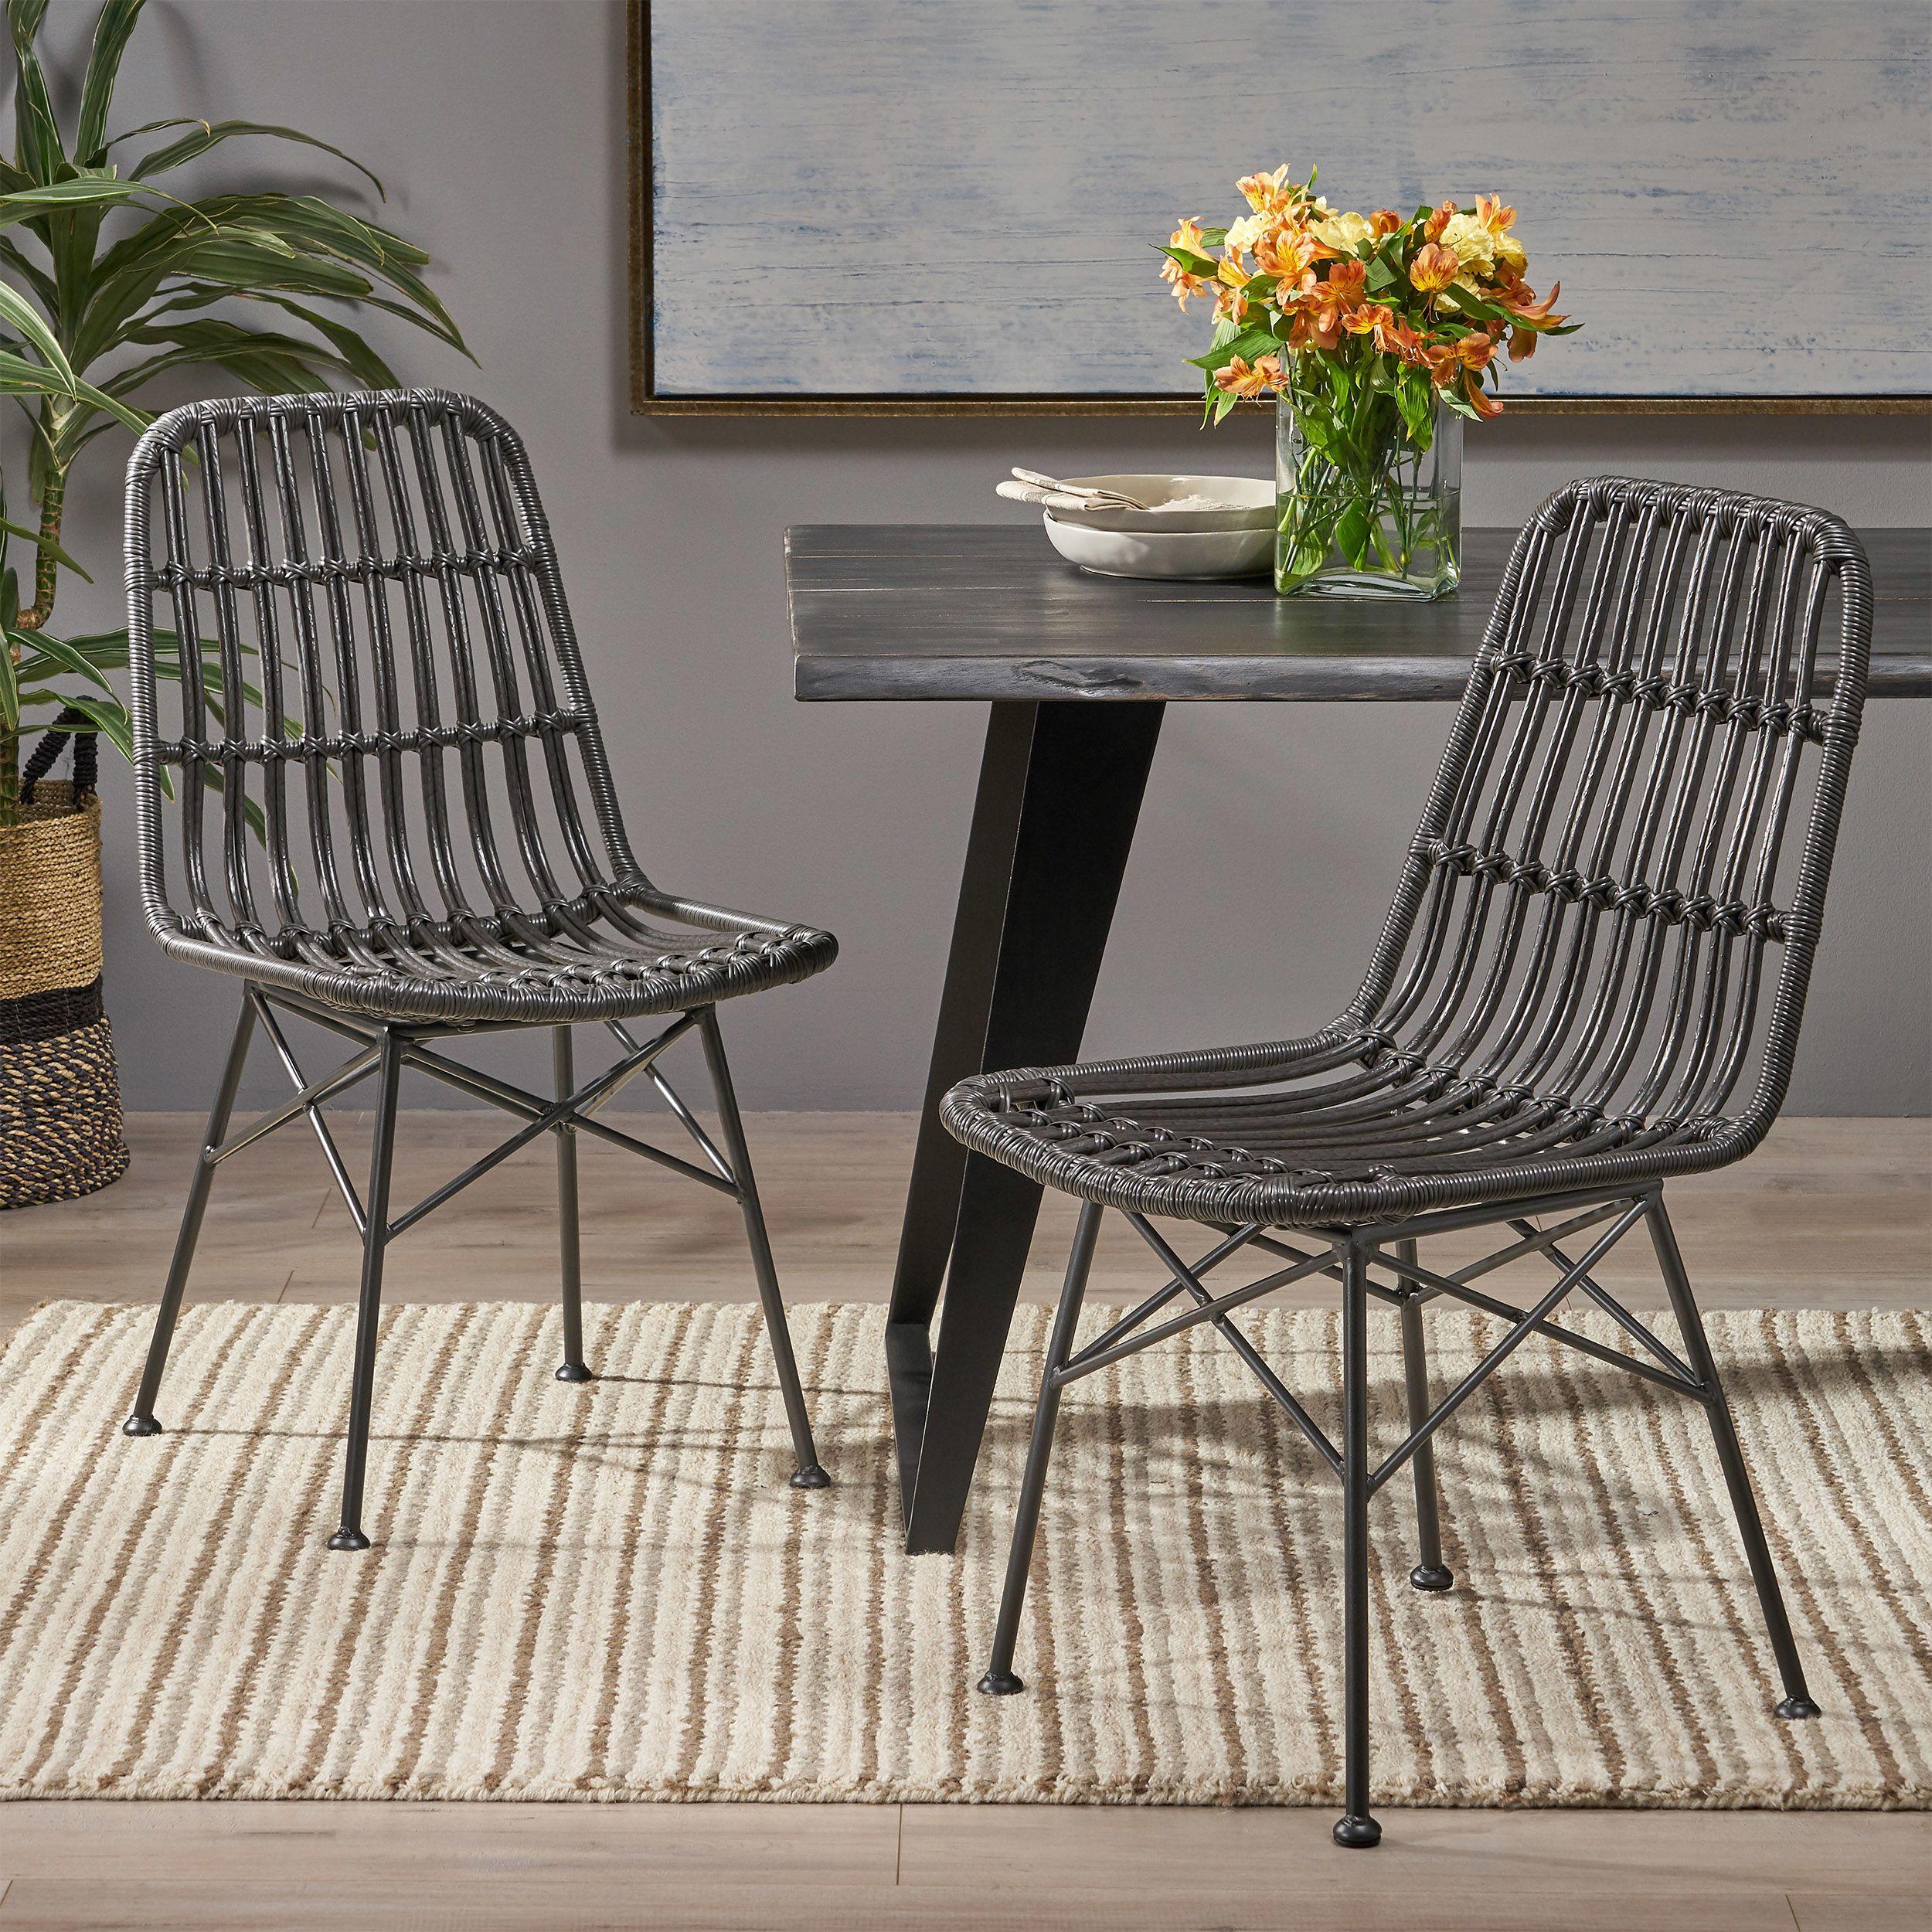 Silverdew Indoor Wicker Dining Chairs Set Of 2 Light Brown